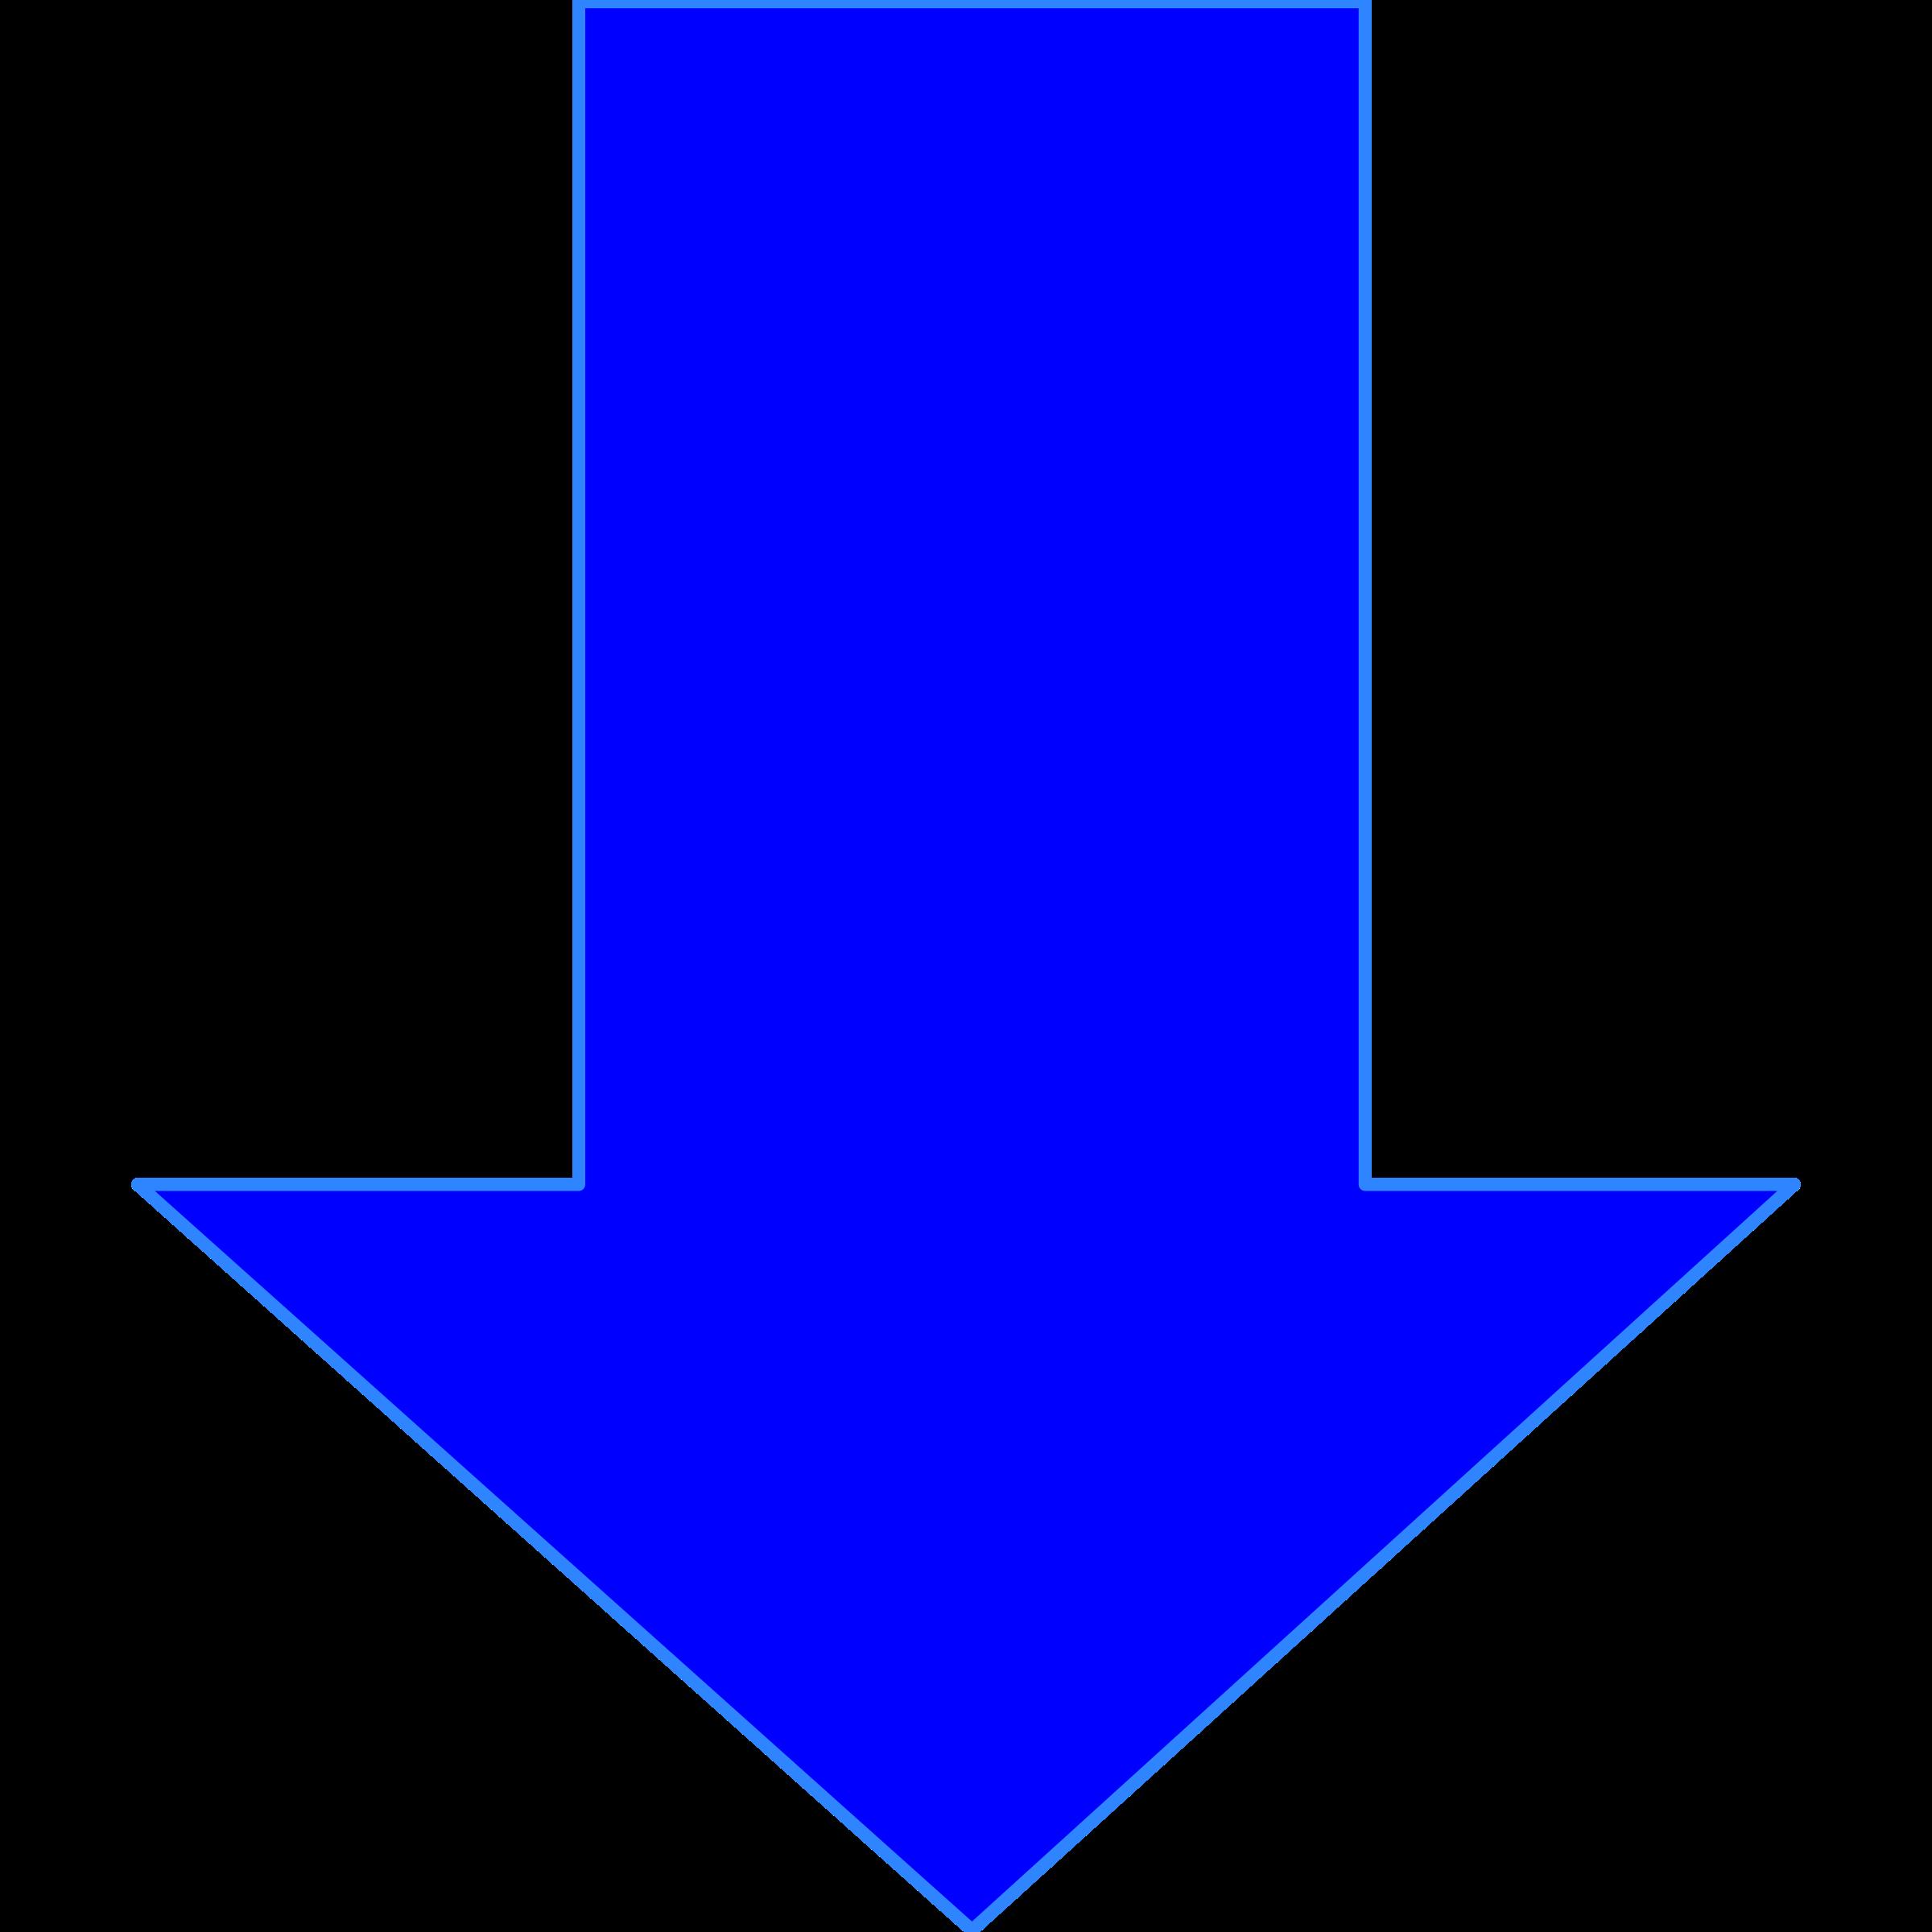 blue arrow clipart www pixshark com images galleries curved arrow clip art black white curved arrow clip art black